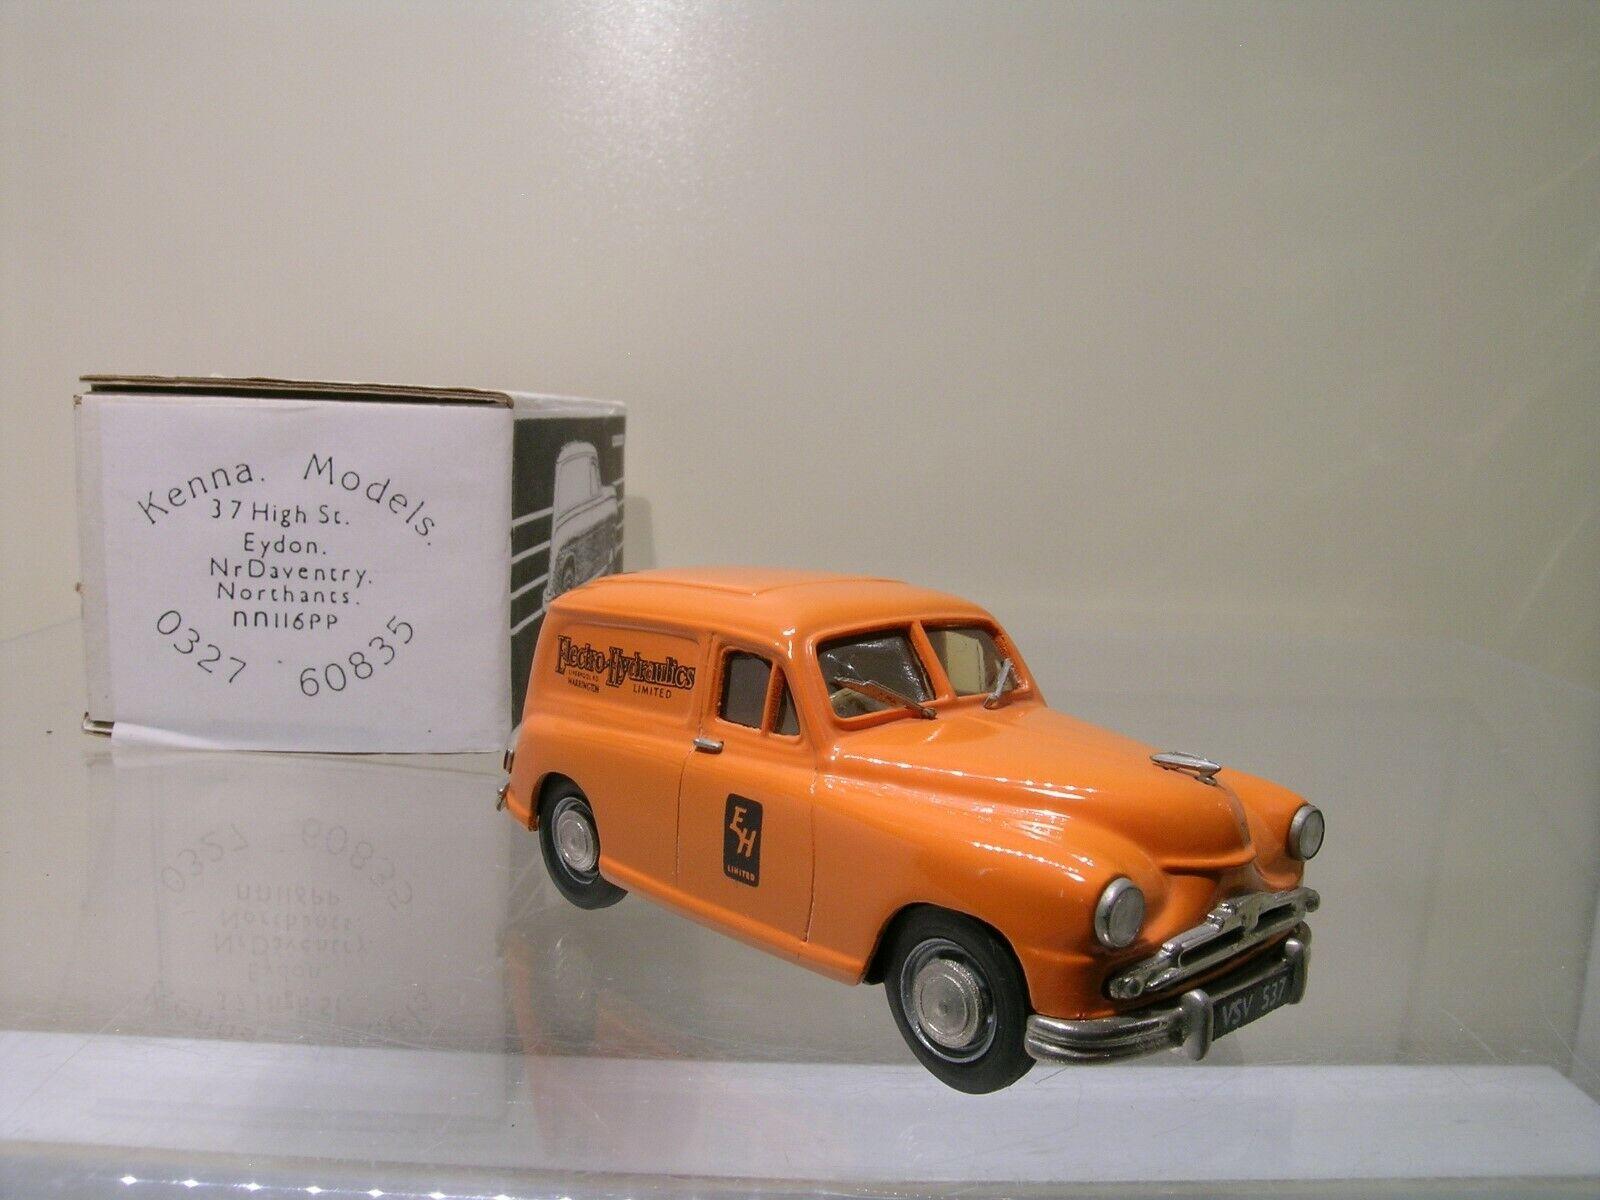 KENNA modellLER STANDARDVANGARD VAN FASE 2 ELECRO HYDR.12 150 orange 1953 1 43